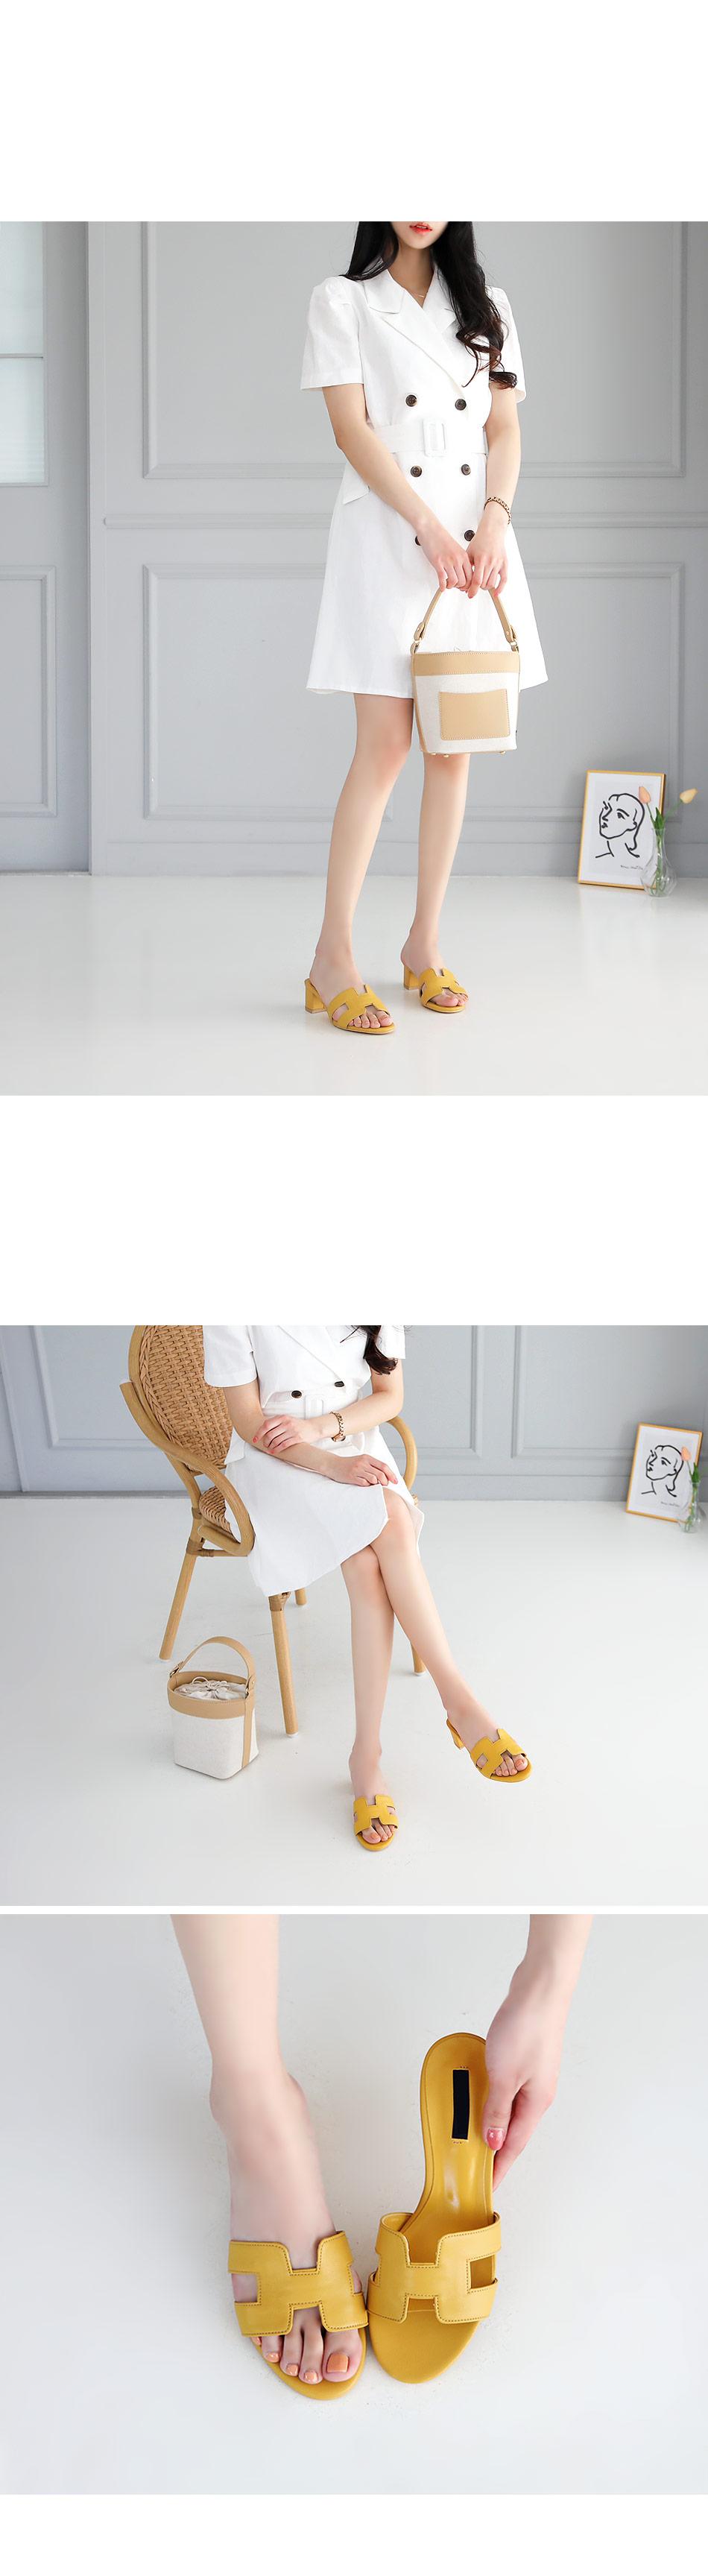 Elapmule slippers 4.5cm